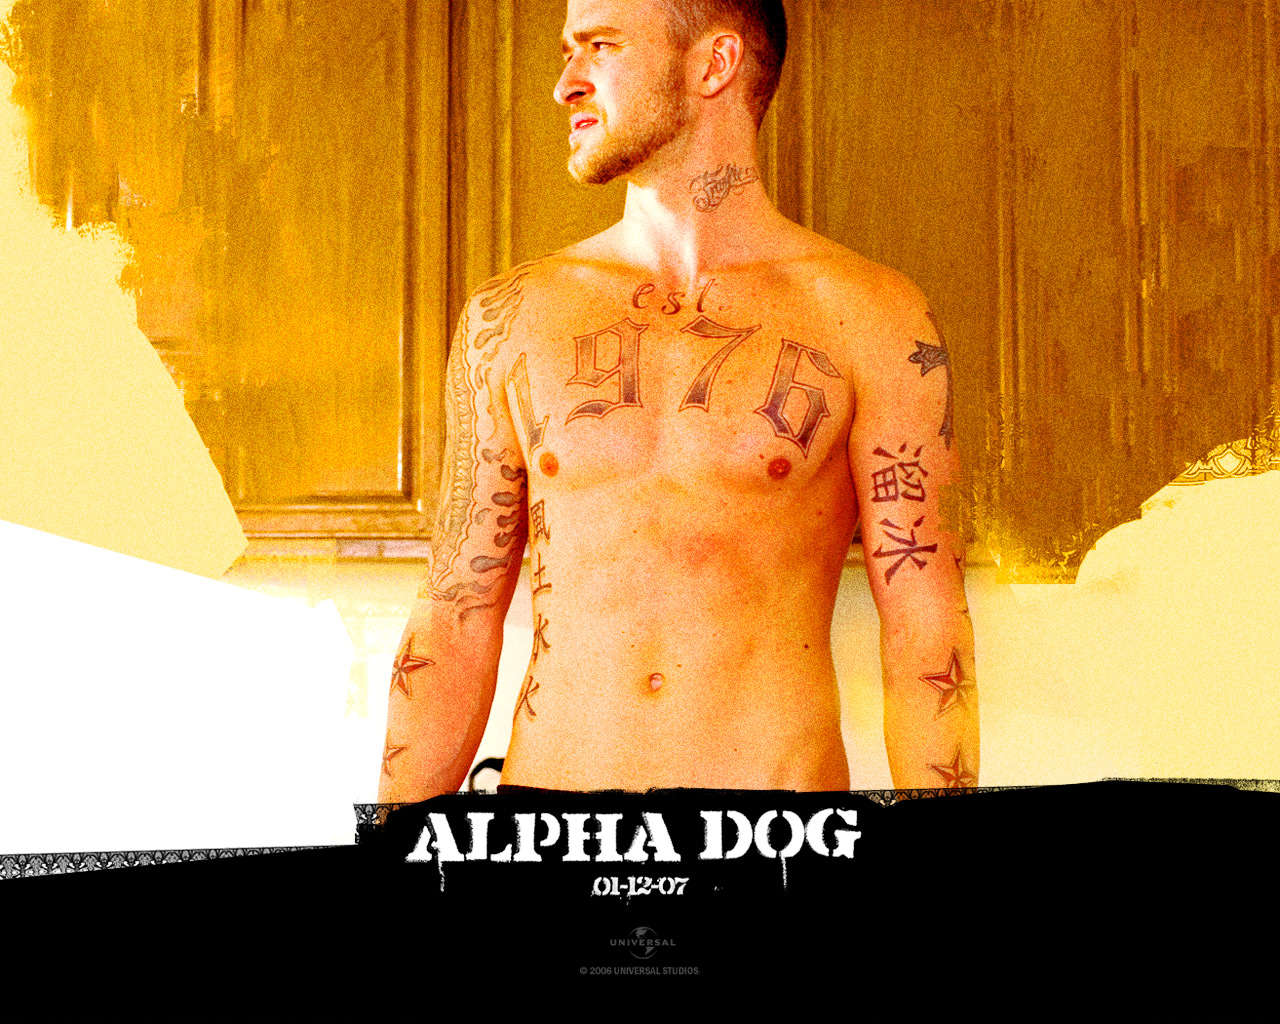 http://1.bp.blogspot.com/-IWy42NDdF4s/UEd6-pM7p_I/AAAAAAAAAJw/mYRCHWH1bDE/s1600/Justin_Timberlake_in_Alpha_Dog_Wallpaper_1_1024.jpg